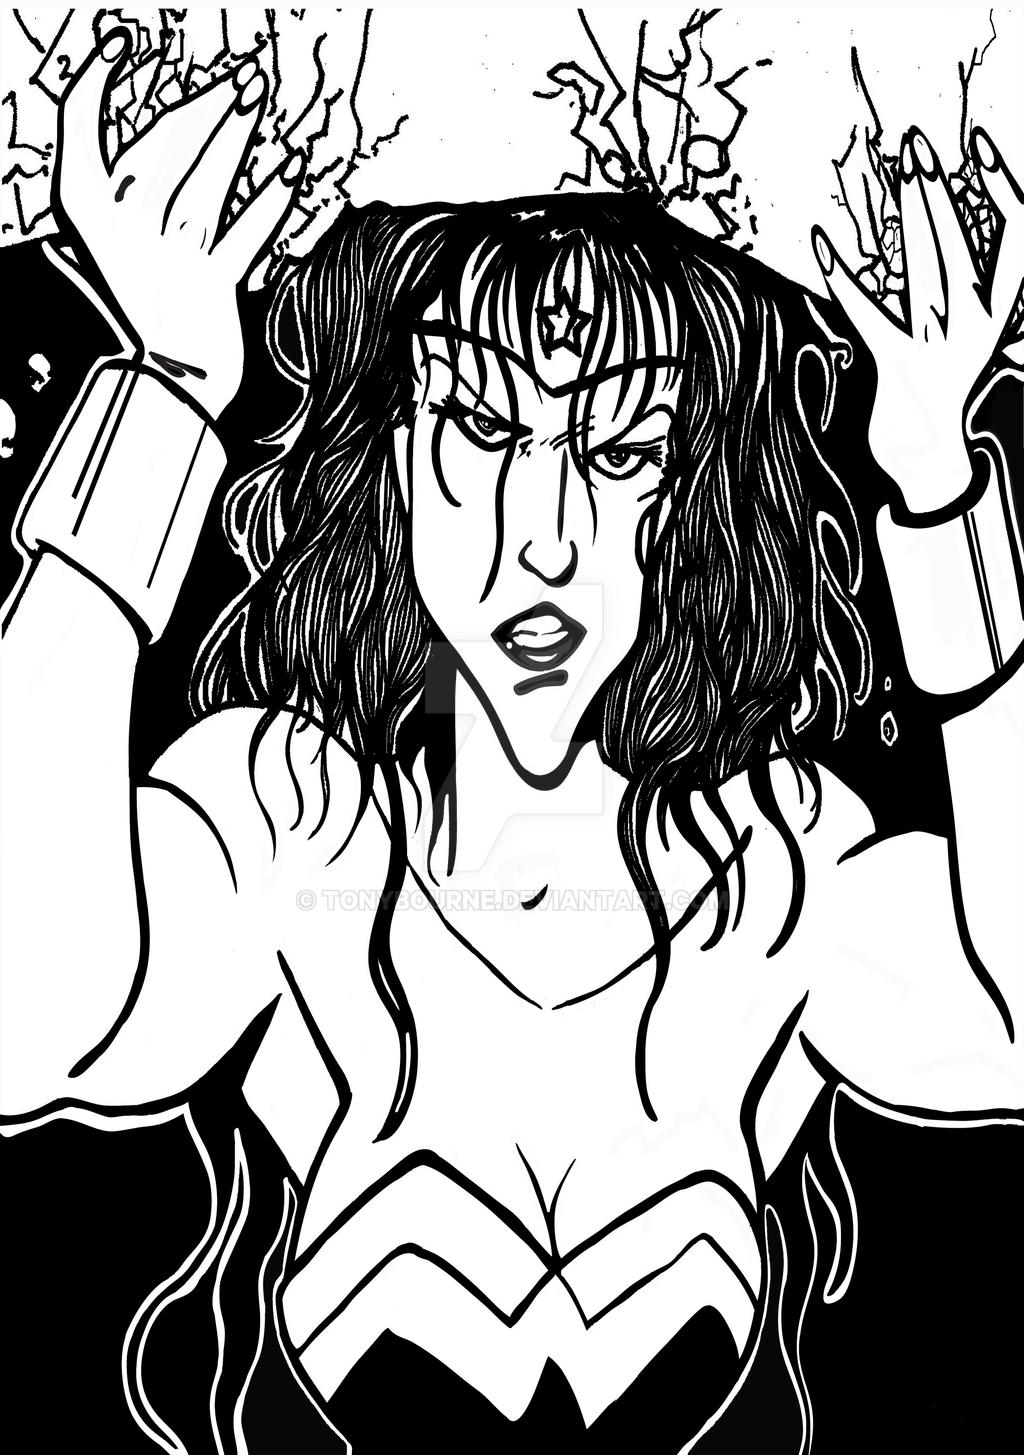 Wonder Woman by TonyBourne